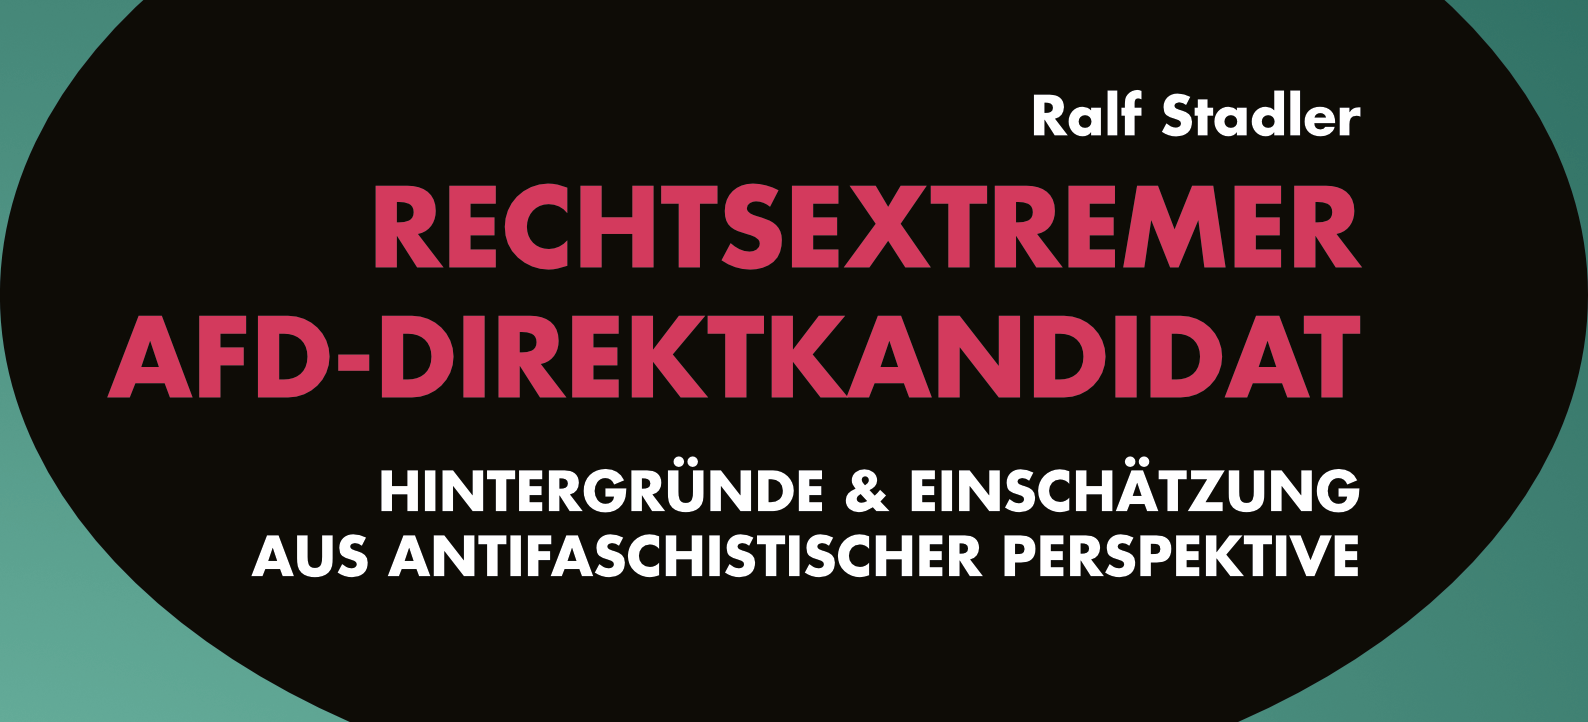 Ralf Stadler - Rechtsextremer AfD-Direktkandidat